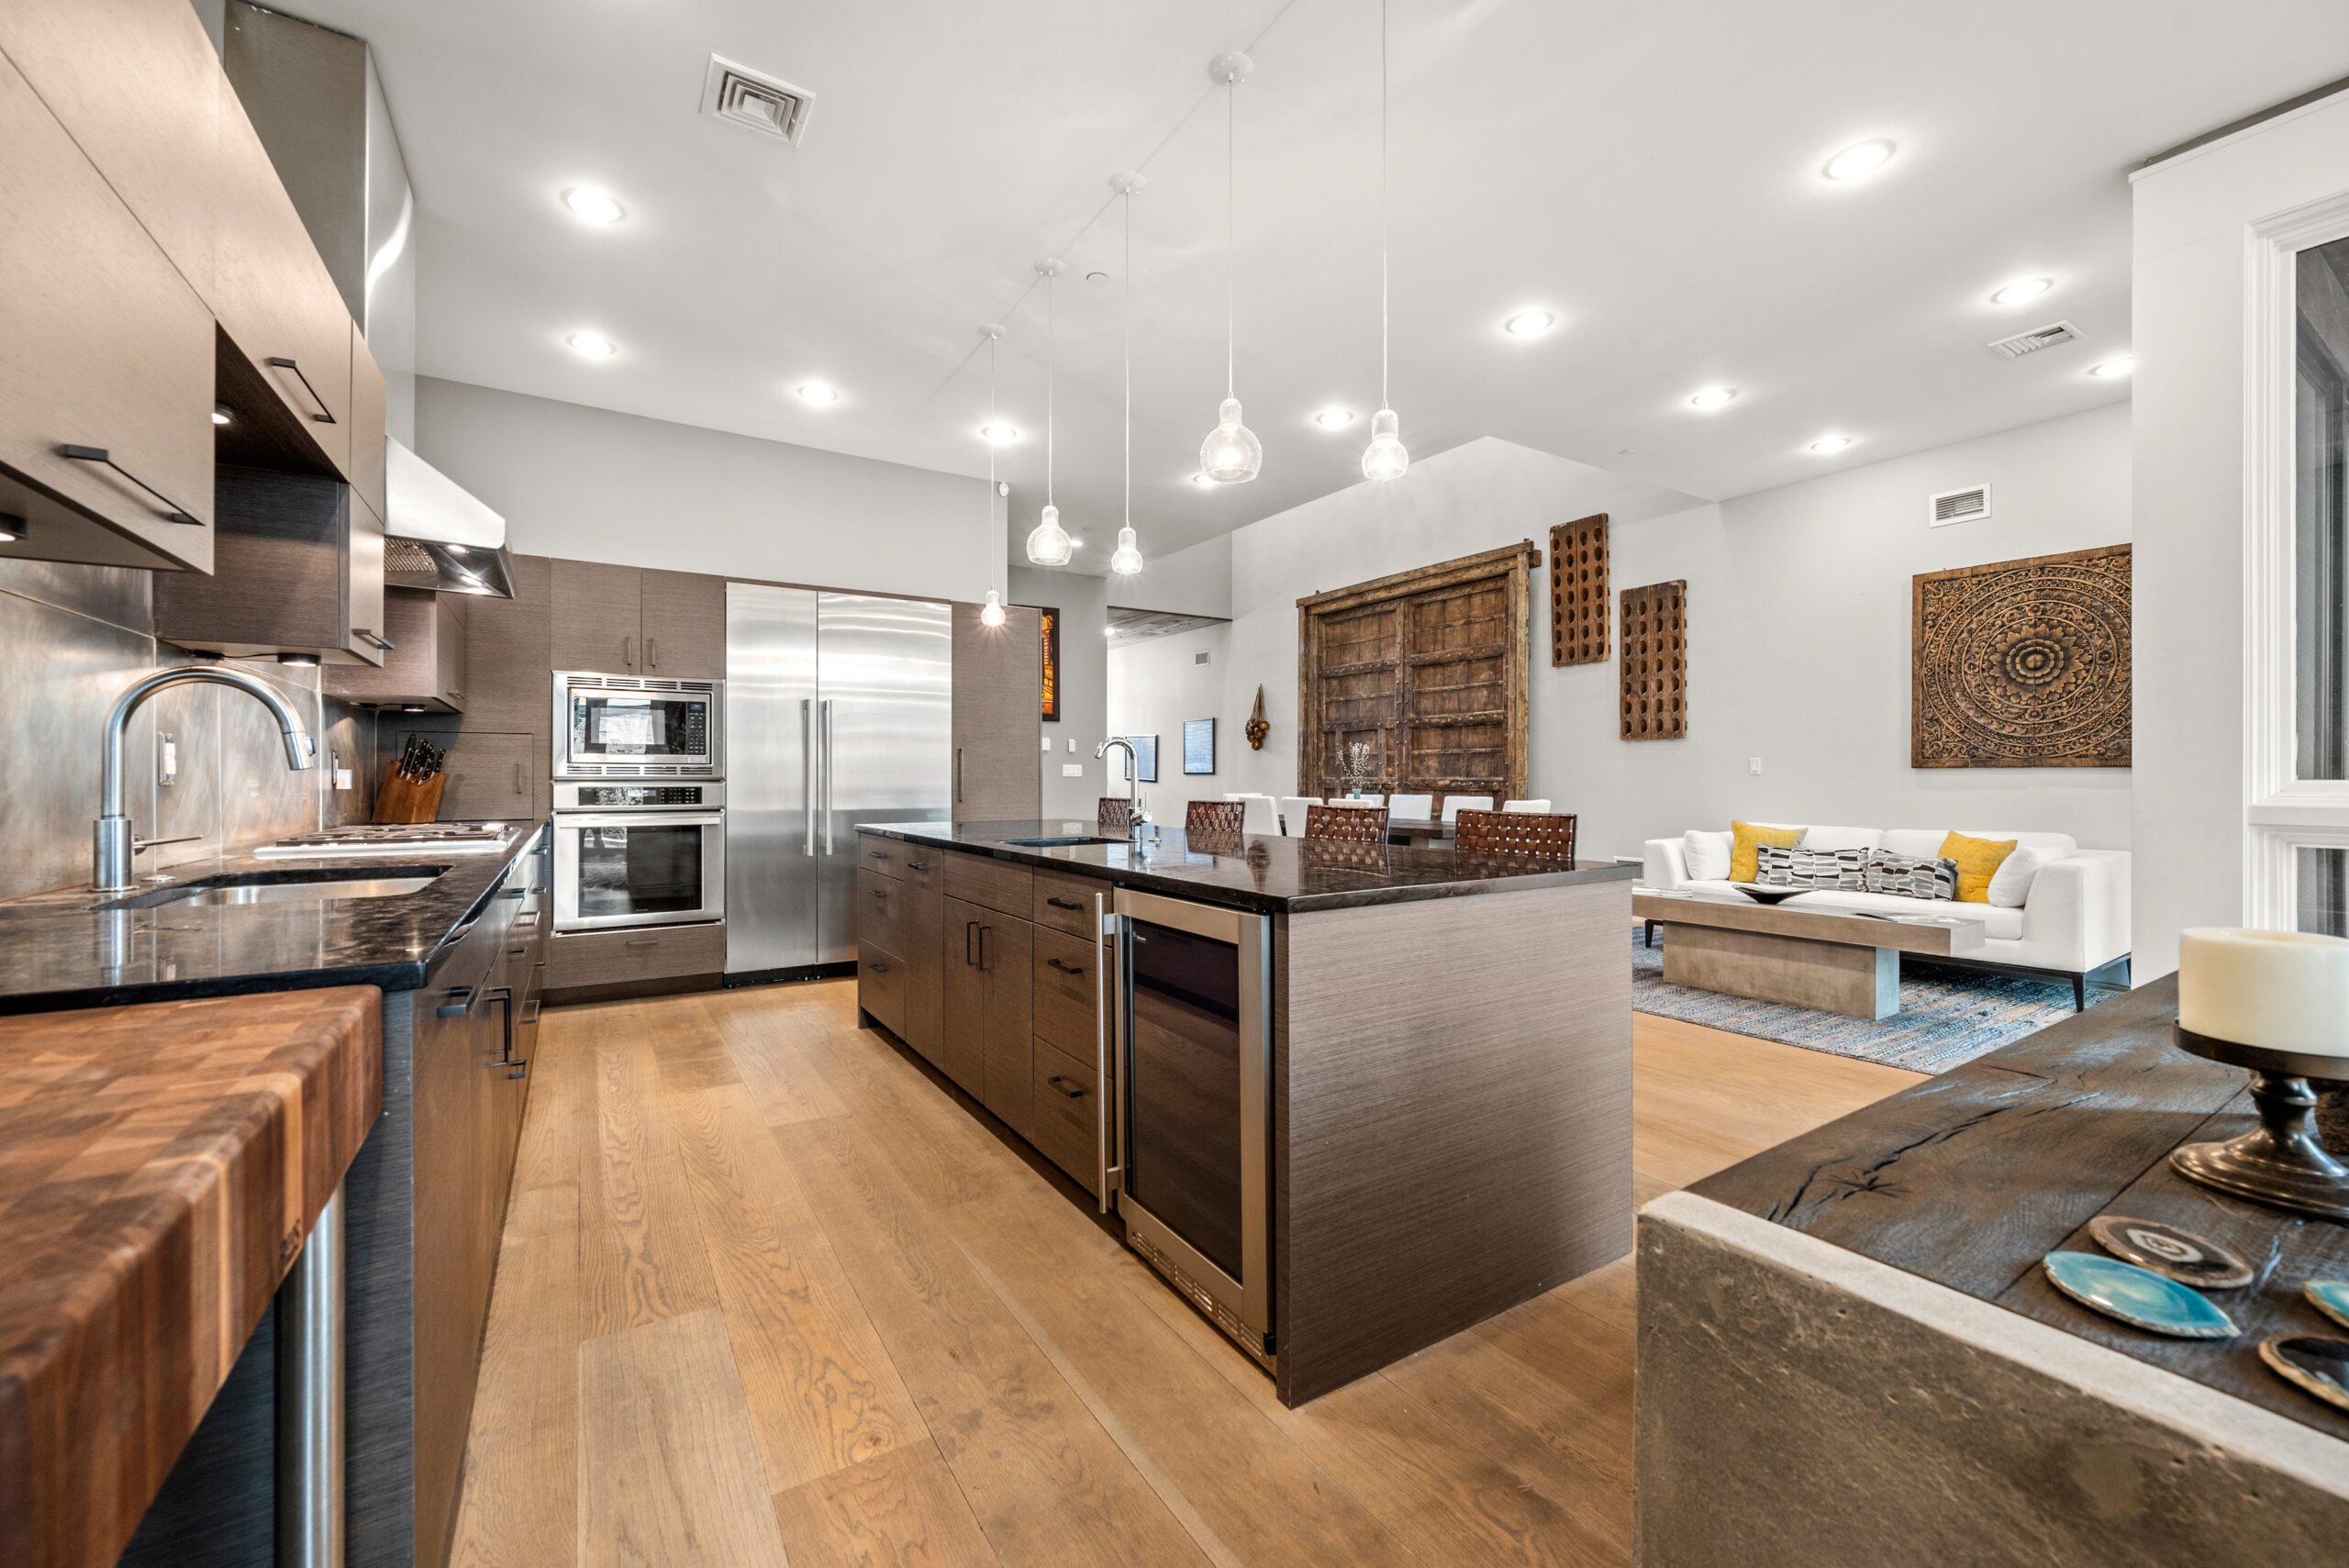 Philadelphia Real Estate Photography of a luxury kitchen